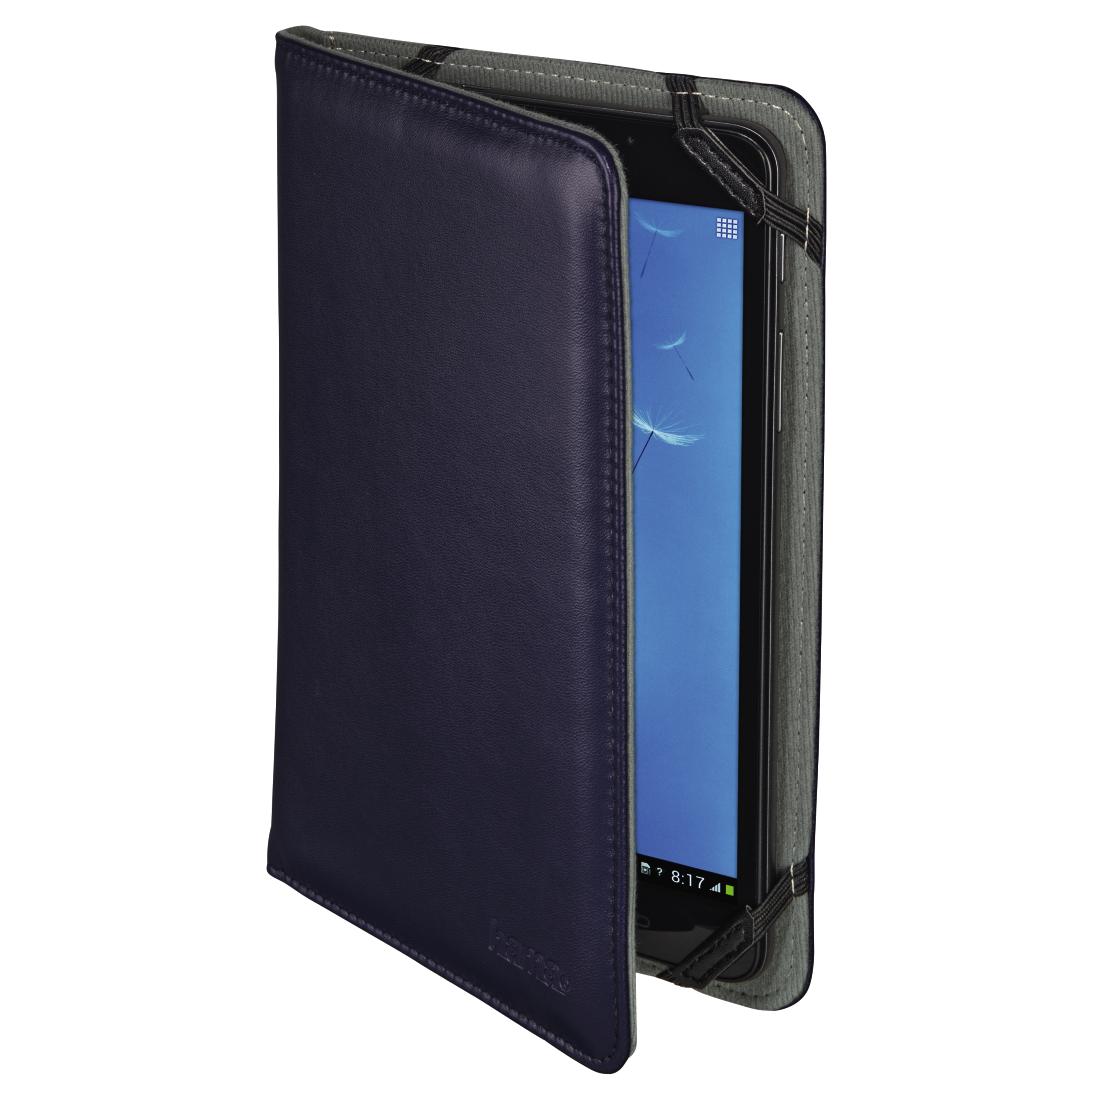 Strange 00173547 Hama Tablet Case Piscine Fur Tablets Bis 17 8 Cm Download Free Architecture Designs Itiscsunscenecom